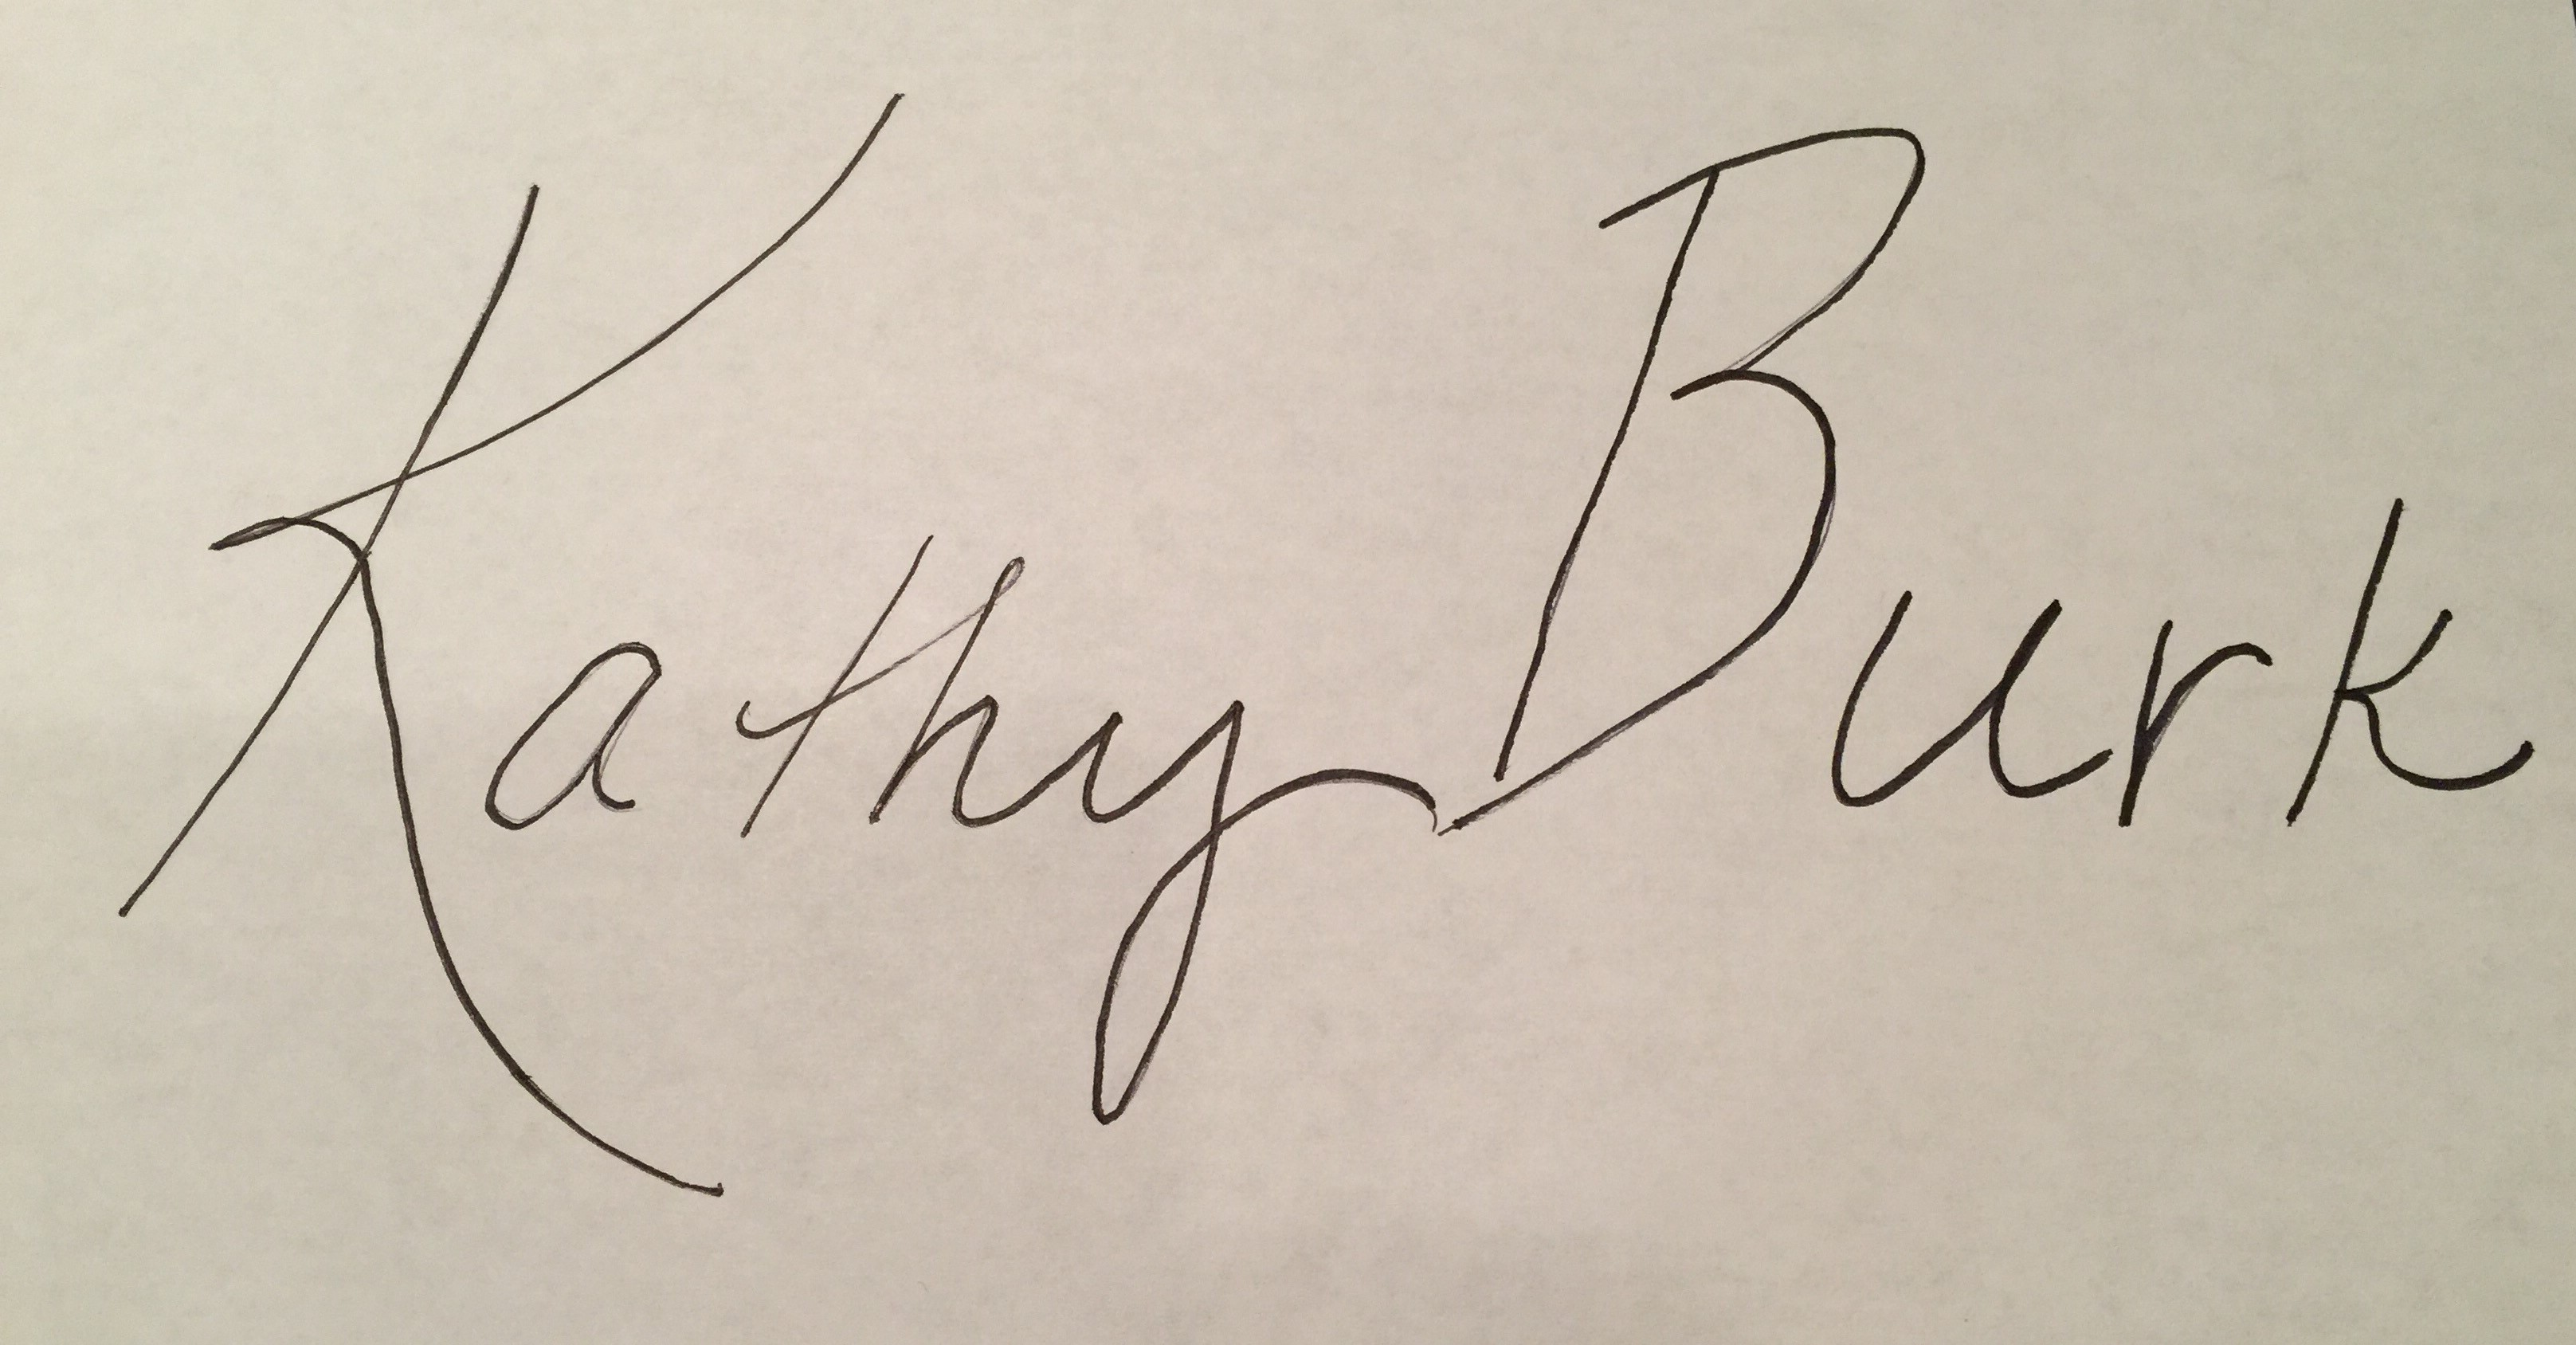 Kathy Burk's Signature